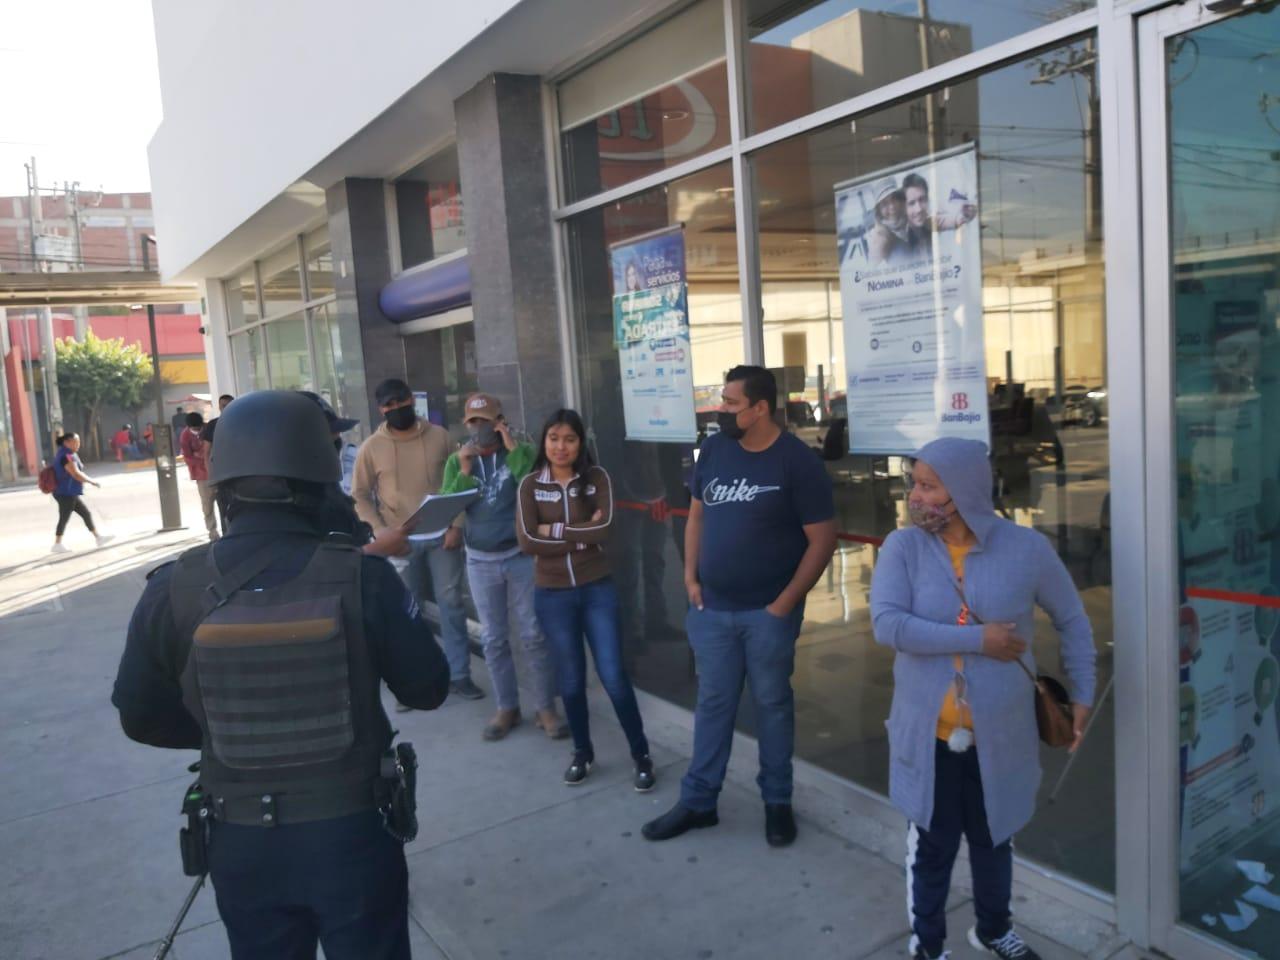 Comienza operativo policial Ámbar por temporada decembrina